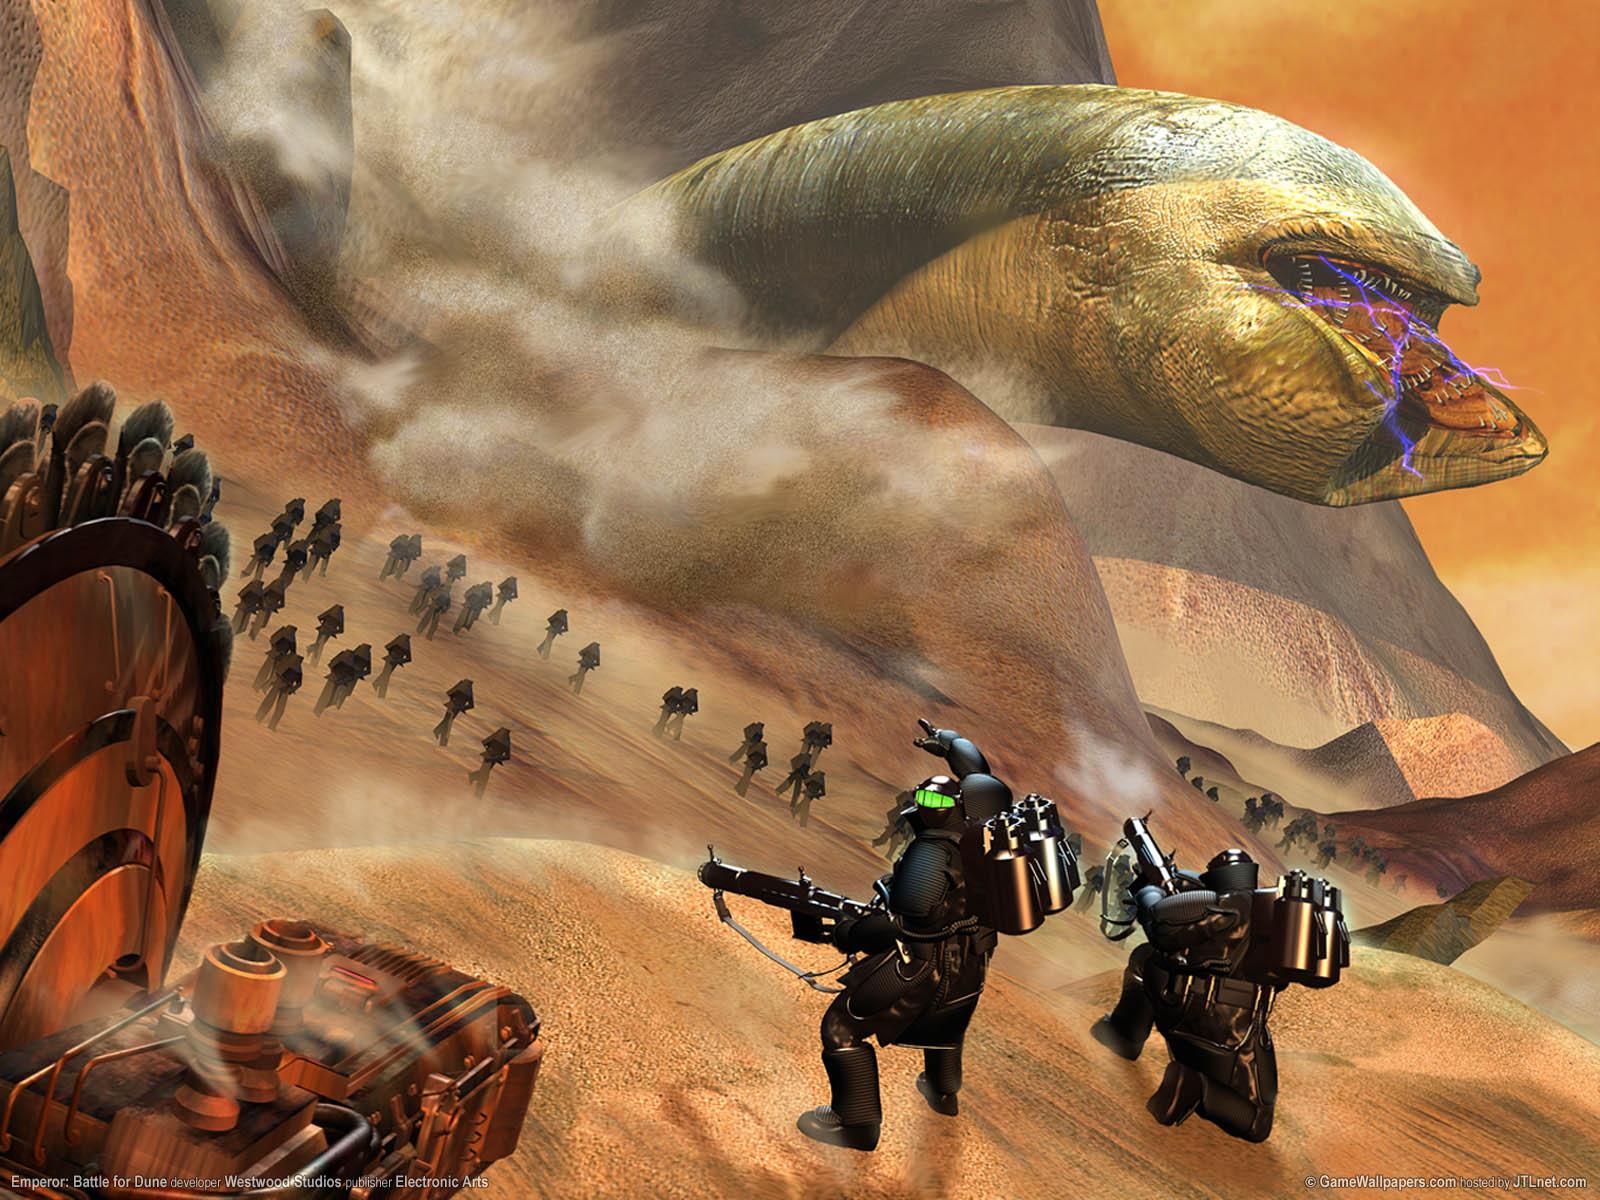 emperor battle for dune wallpaper 07 1600x1200